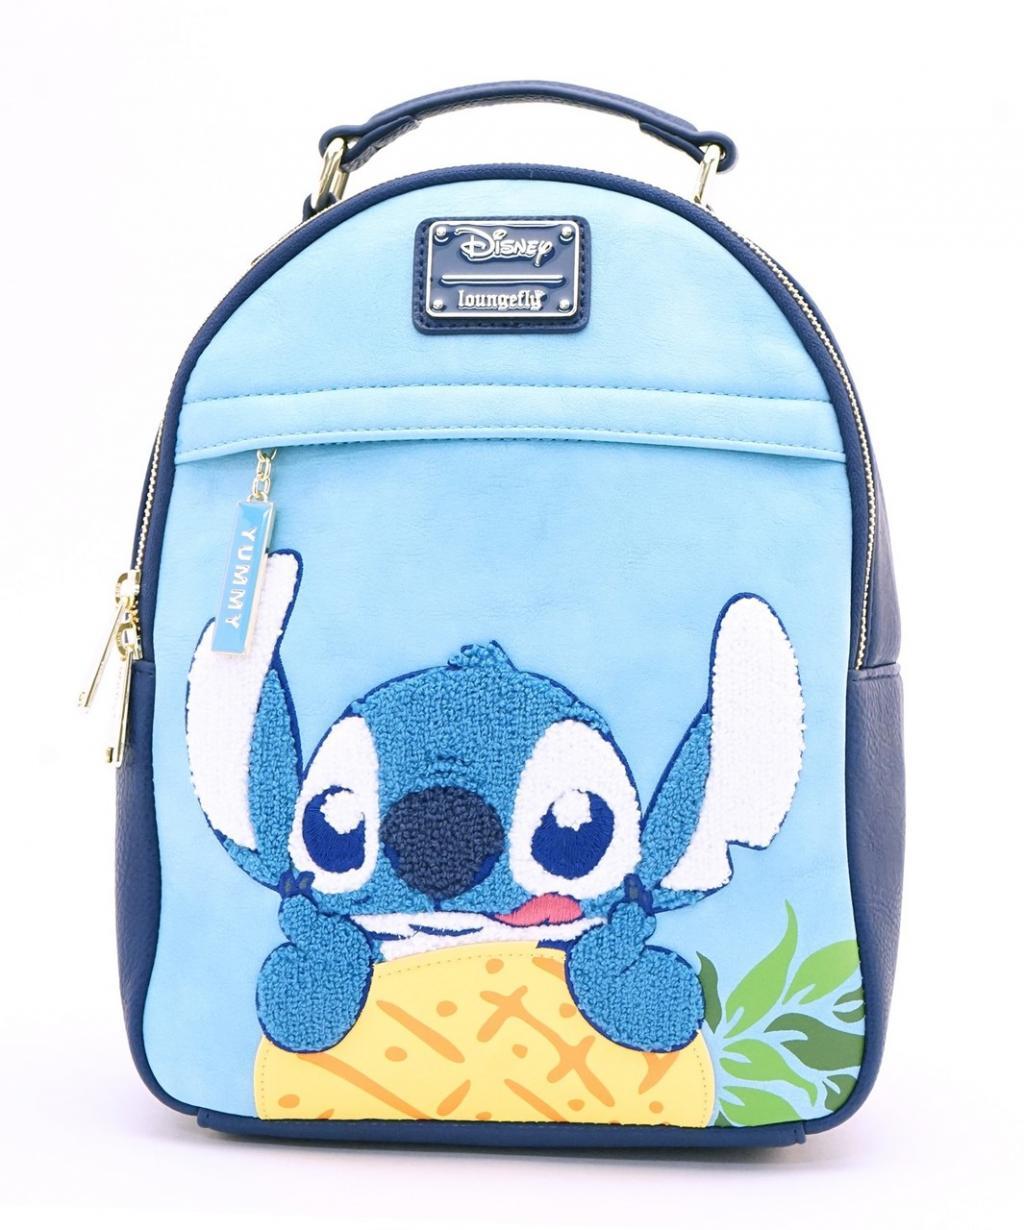 DISNEY - Lilo & Stitch Pineapple Mini Backpack 'LoungeFly'